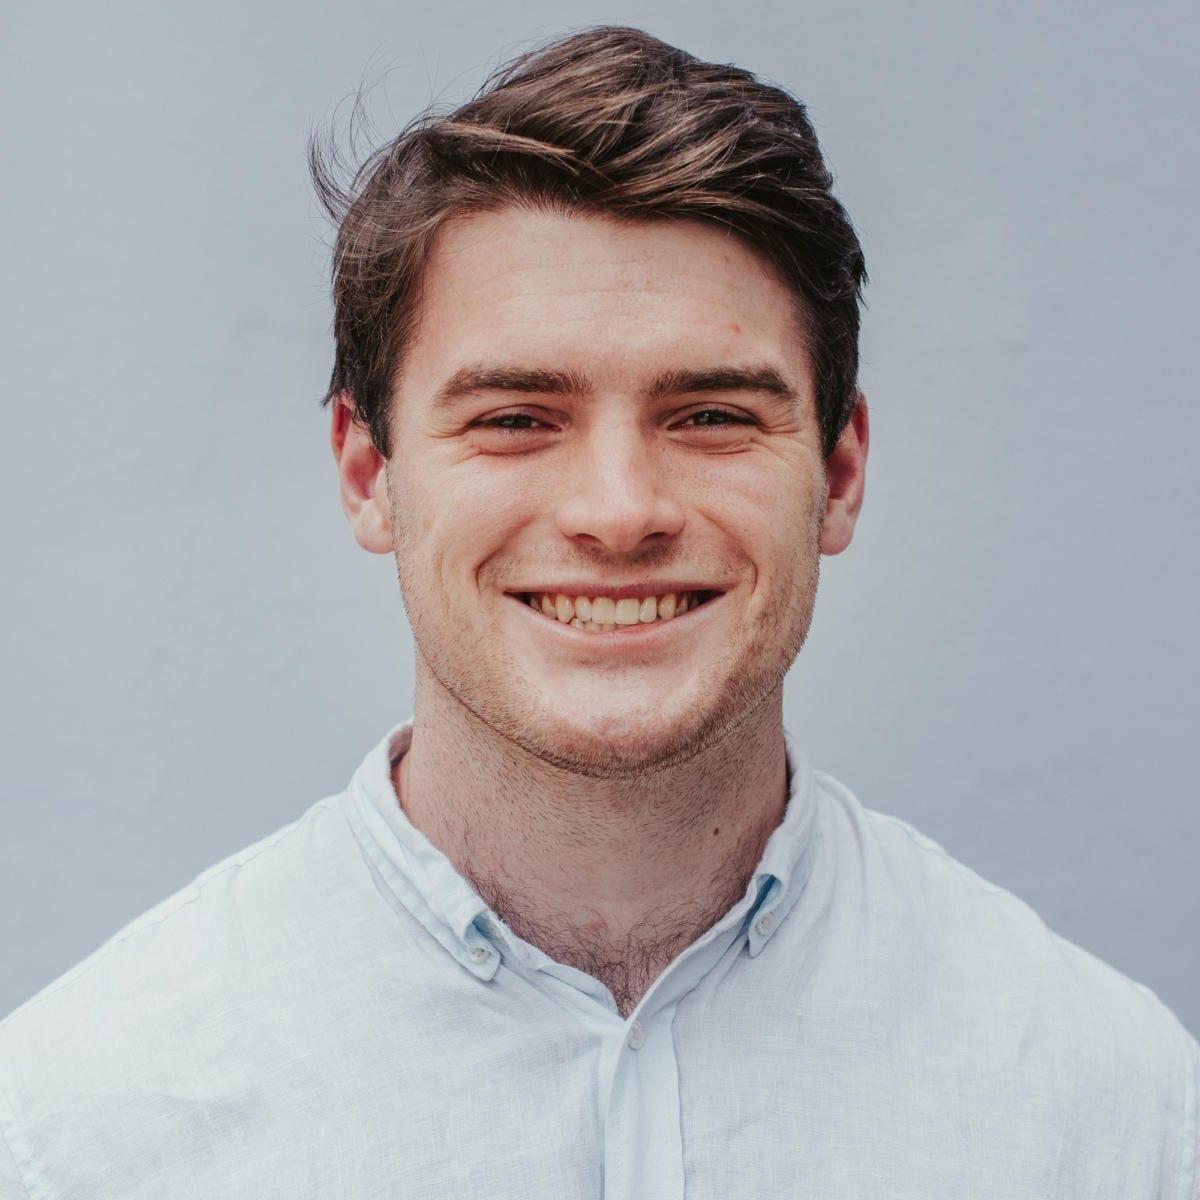 Member - Jacob Smith